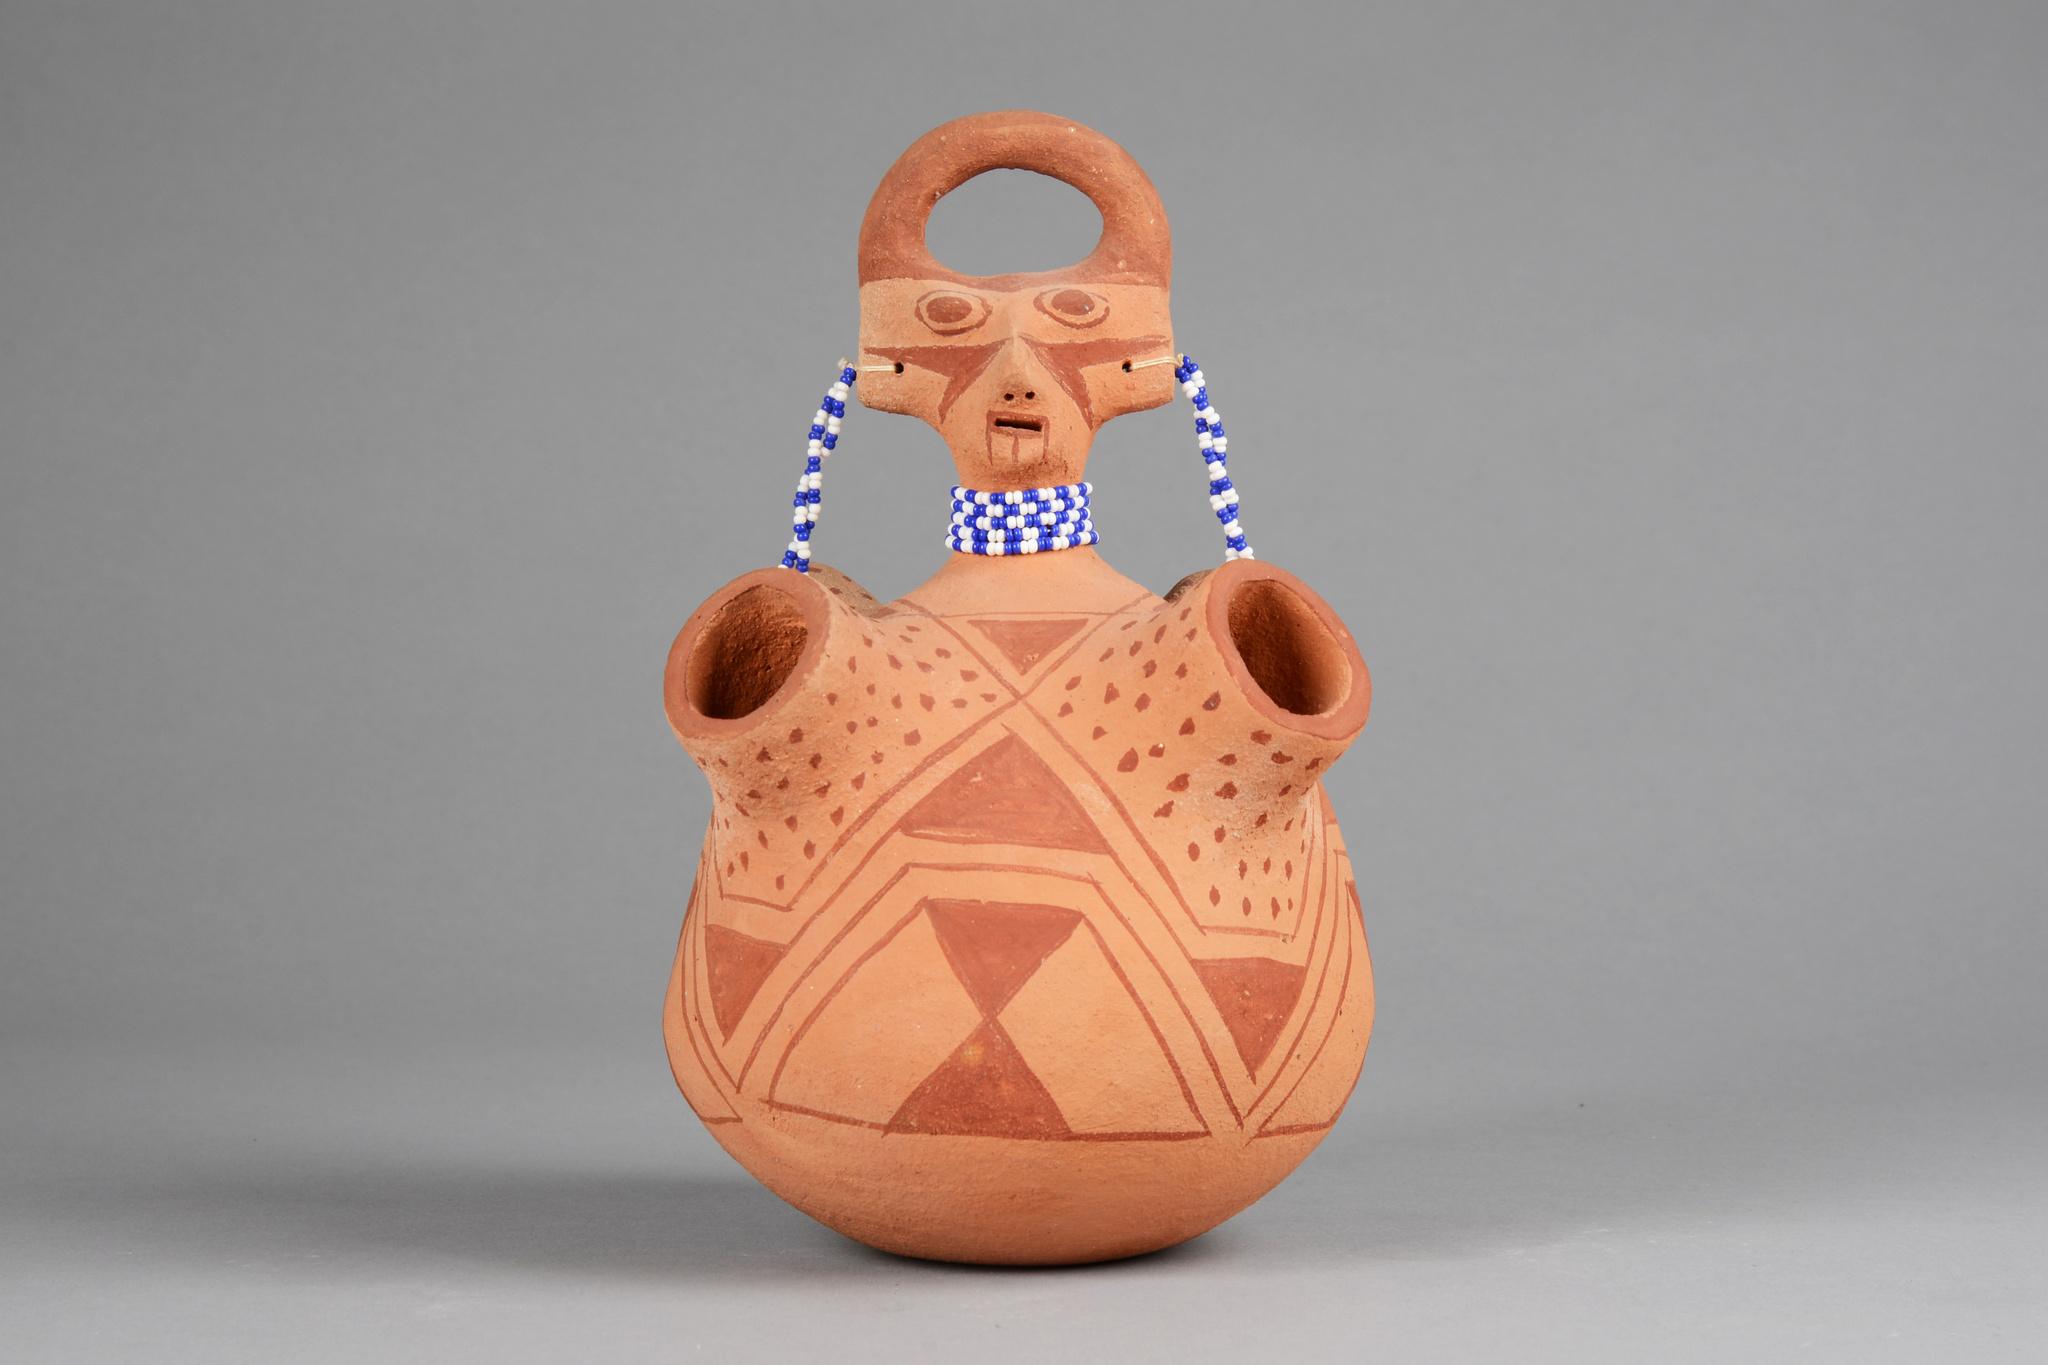 Anthropomorphic jar